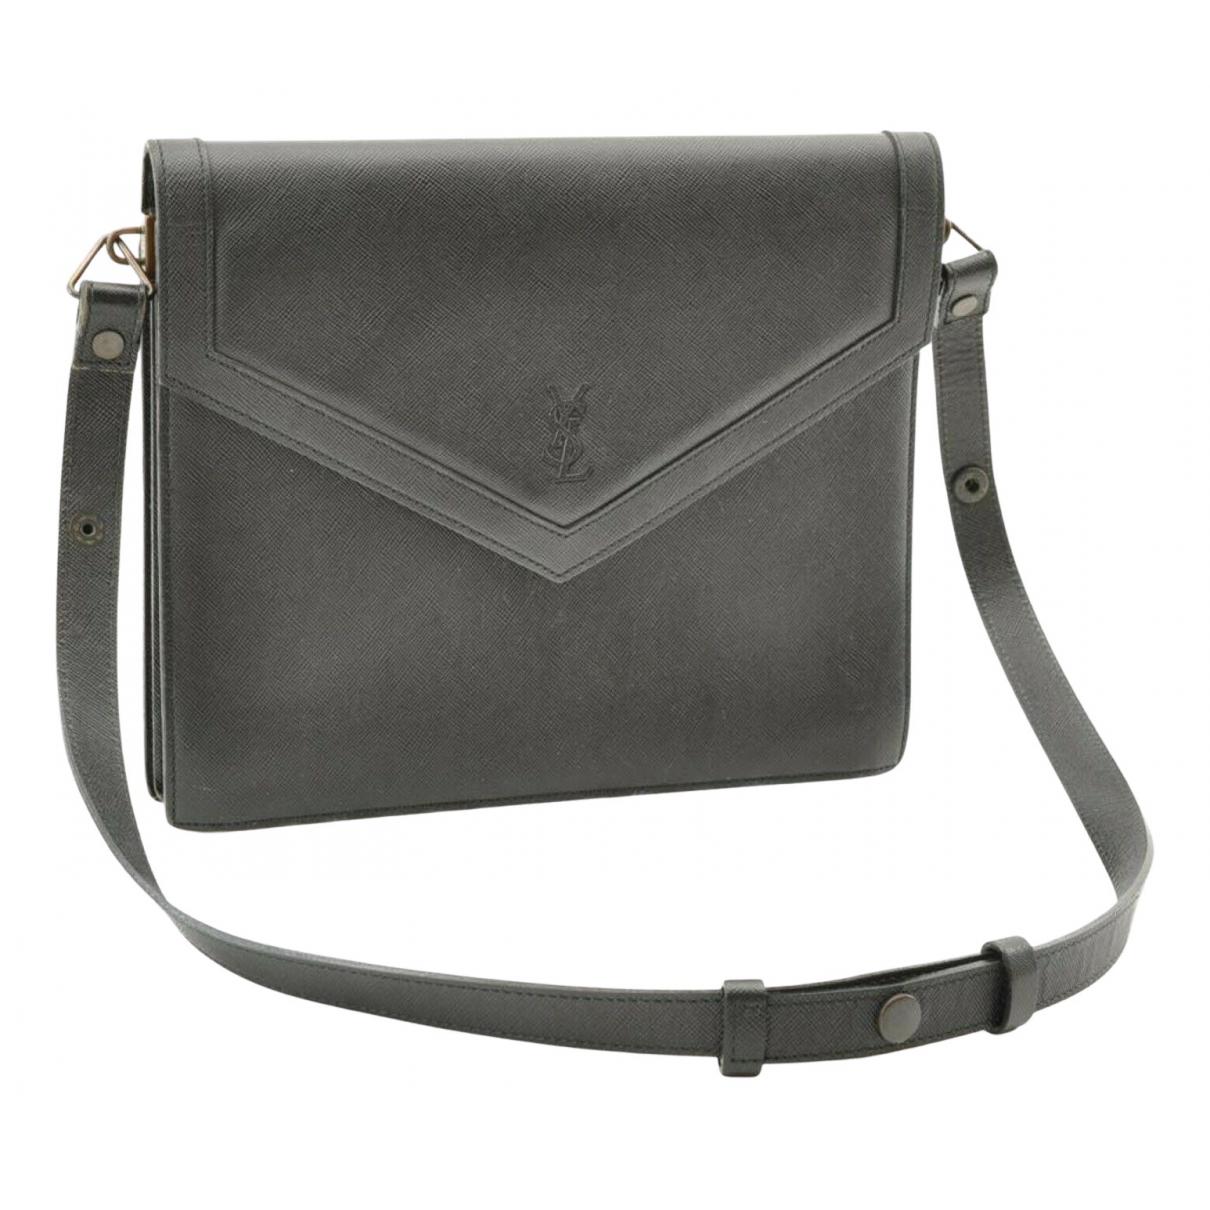 Saint Laurent N Grey Leather handbag for Women N